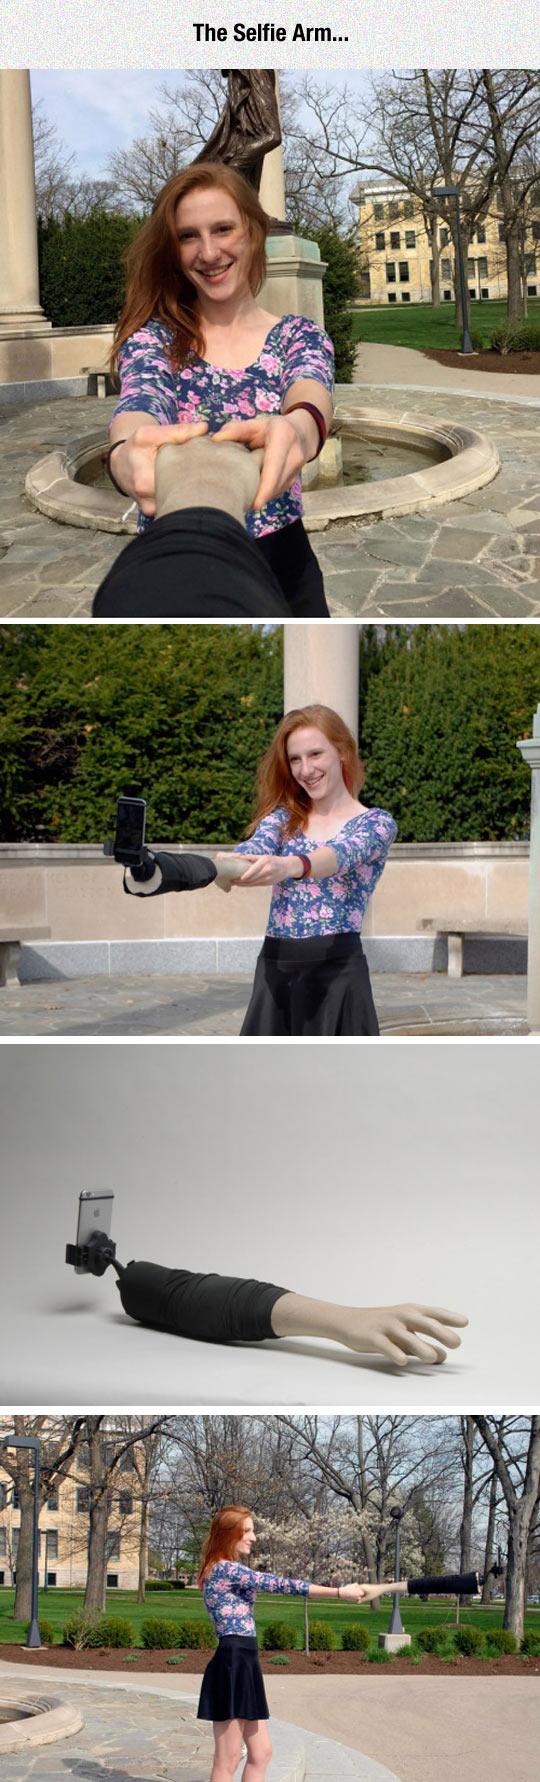 funny-selfie-arm-girl-alone